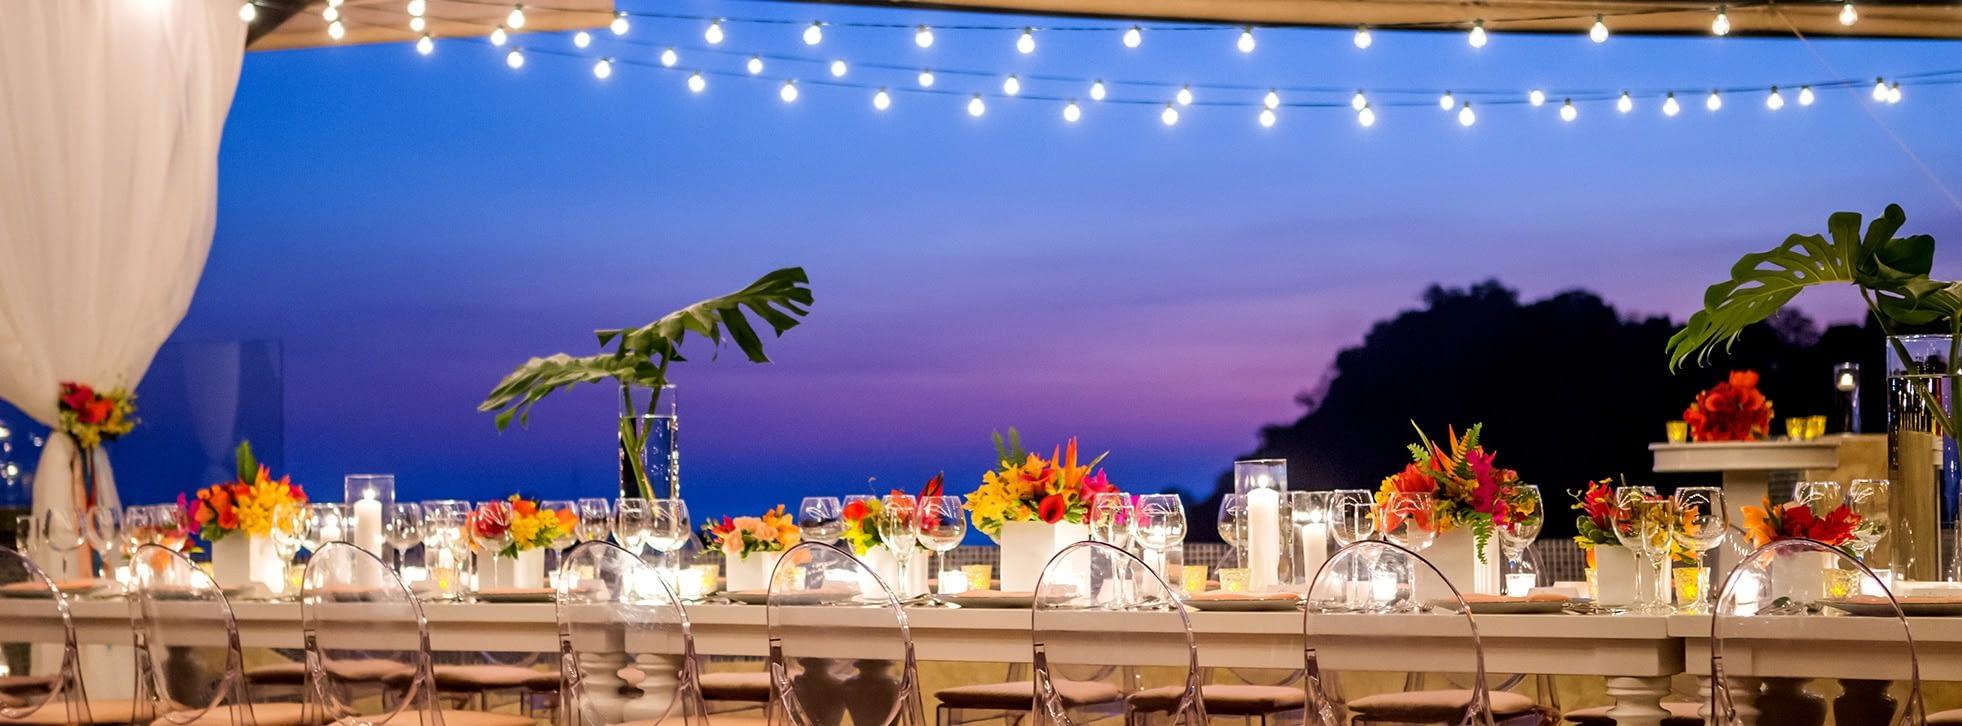 wedding reception in luxury villa